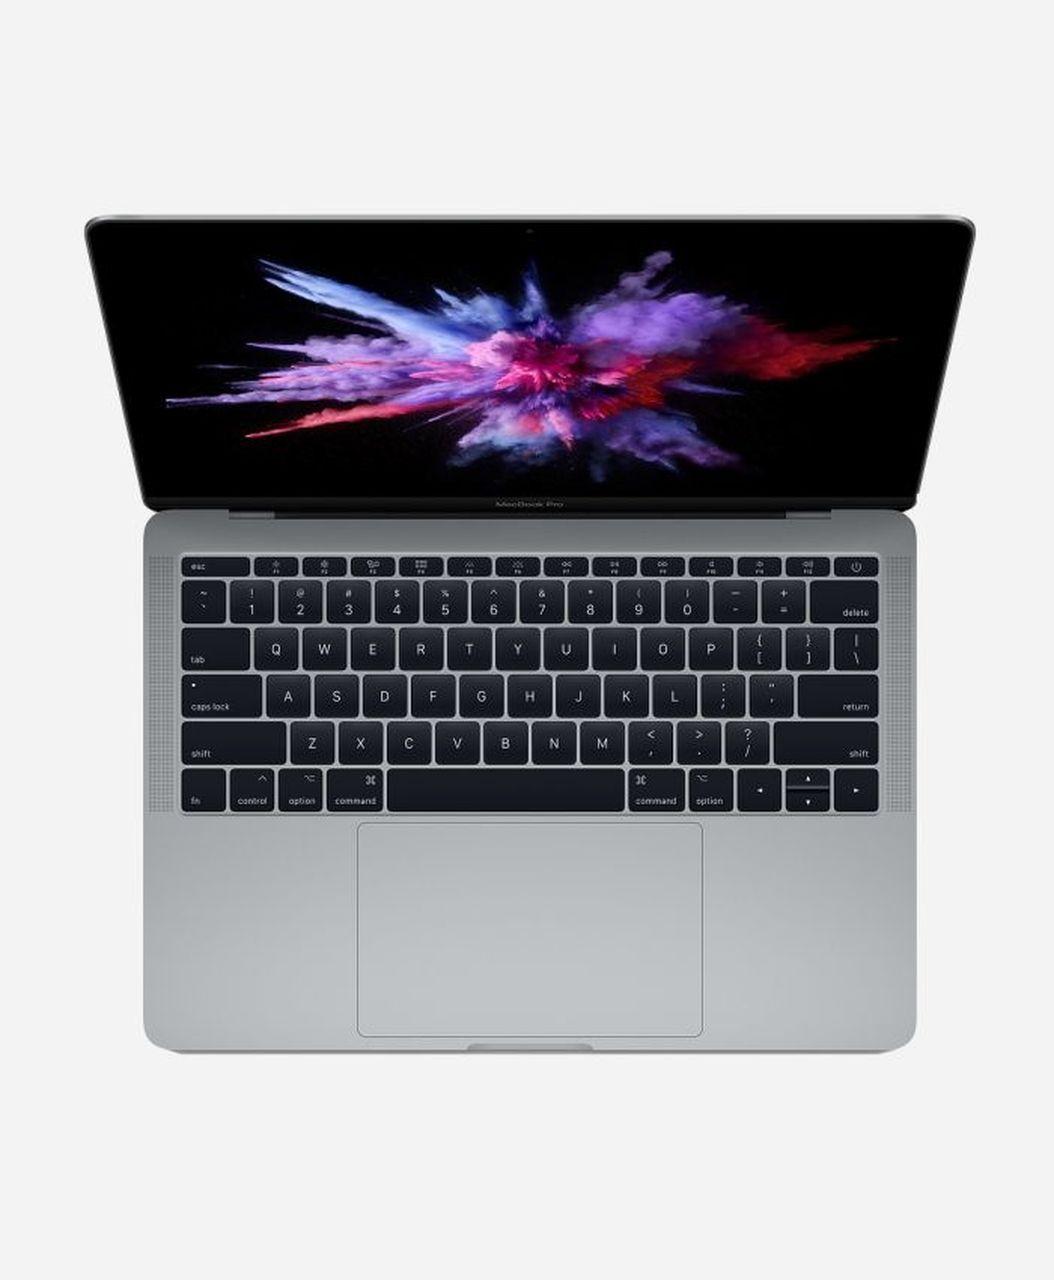 Macbook Pro 13 3 Inch Retina Space Gray 2 0ghz Dual Core I5 Late 2016 Apple Mll42ll A In 2020 Macbook Pro 13 Inch Macbook Pro 13 Apple Macbook